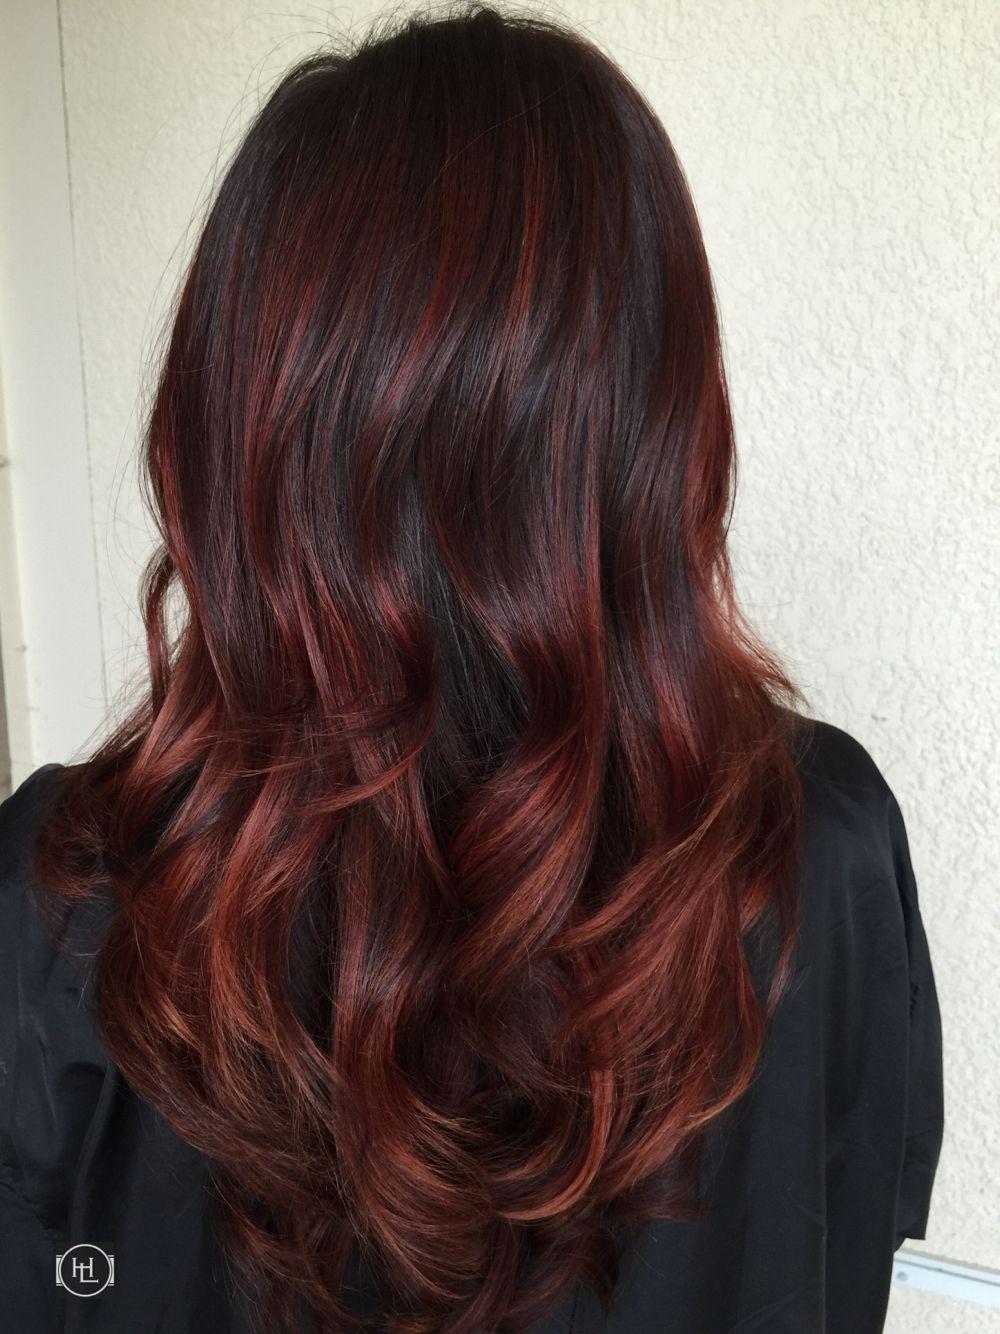 Red Balayage @Hairlegacy Inc. Hair by:Emilio V.